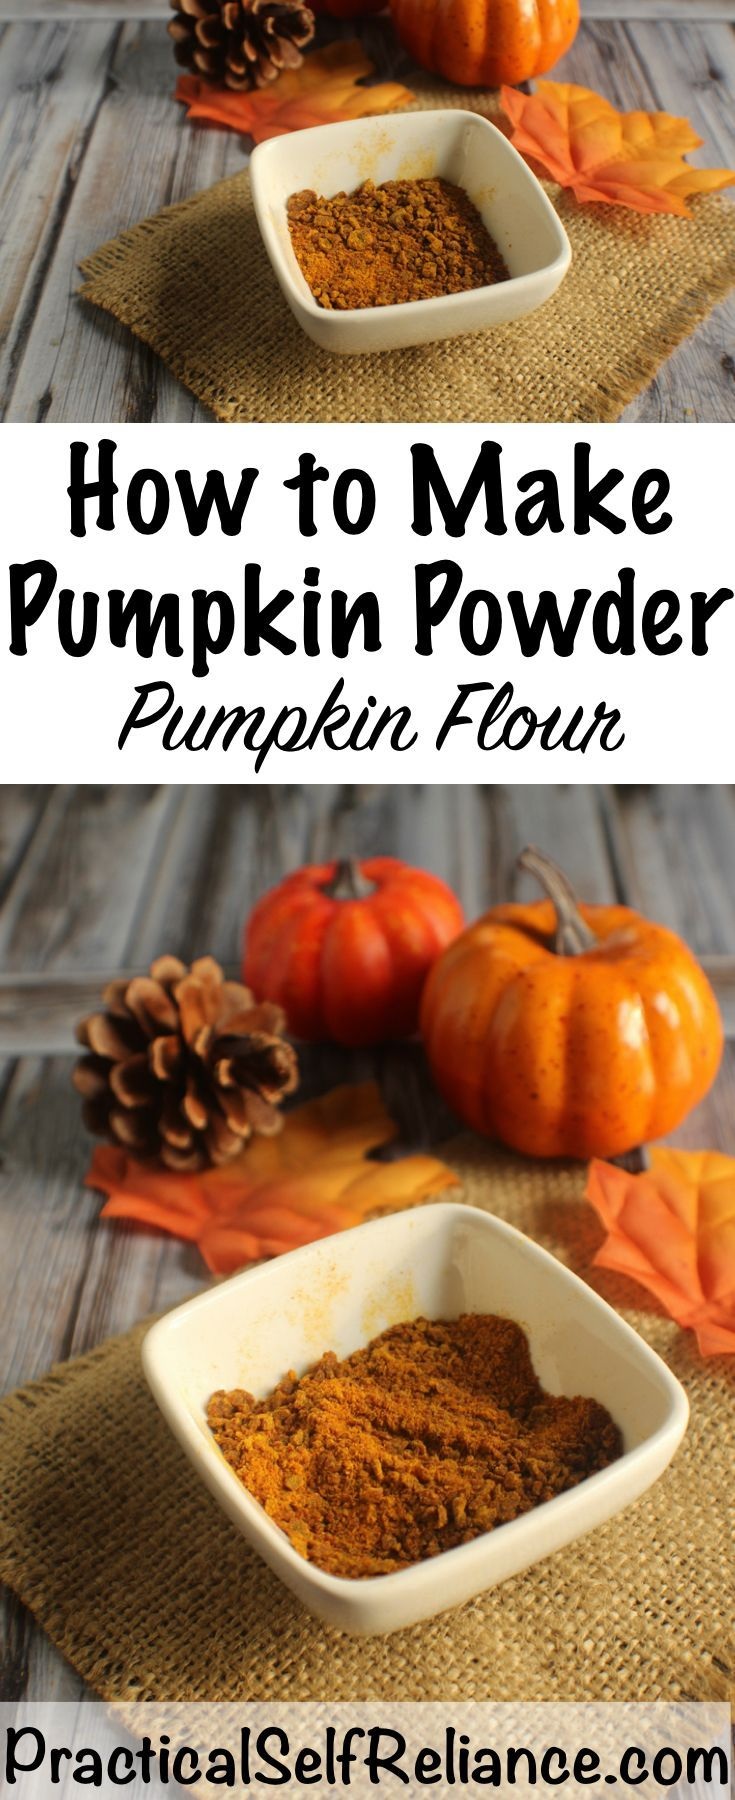 How to Make Pumpkin Powder (Pumpkin Flour)